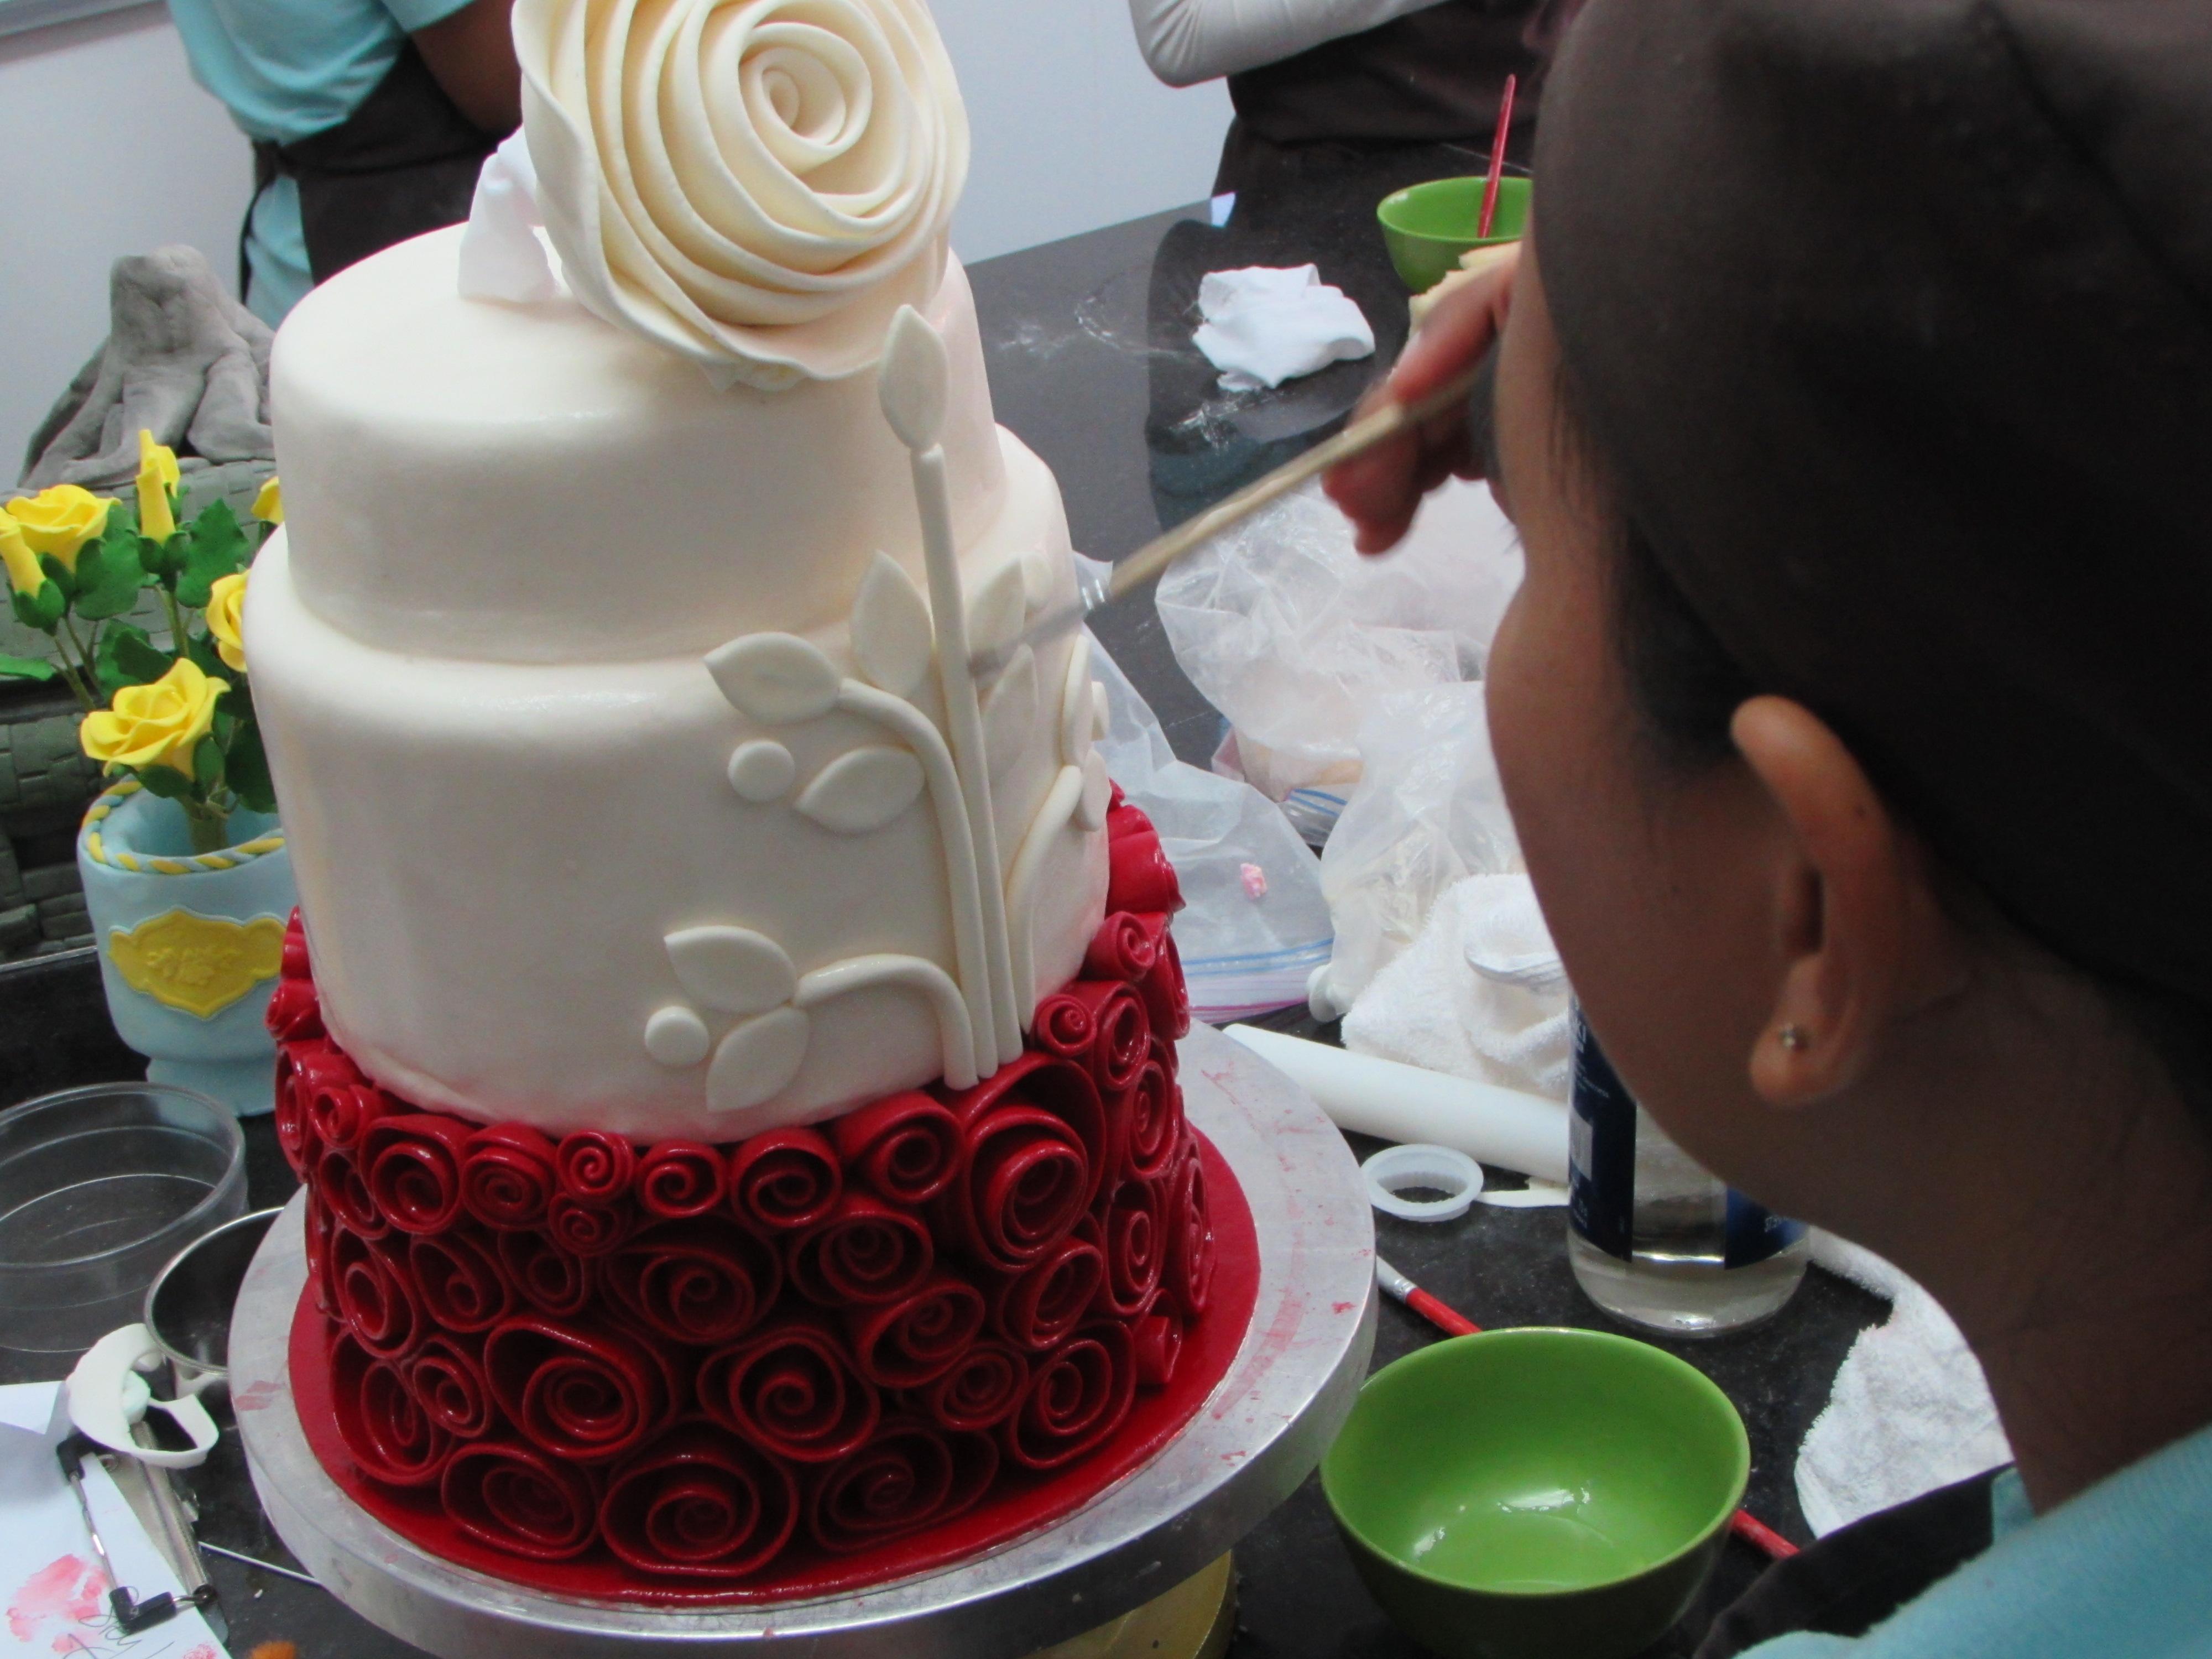 Training Rose Cake